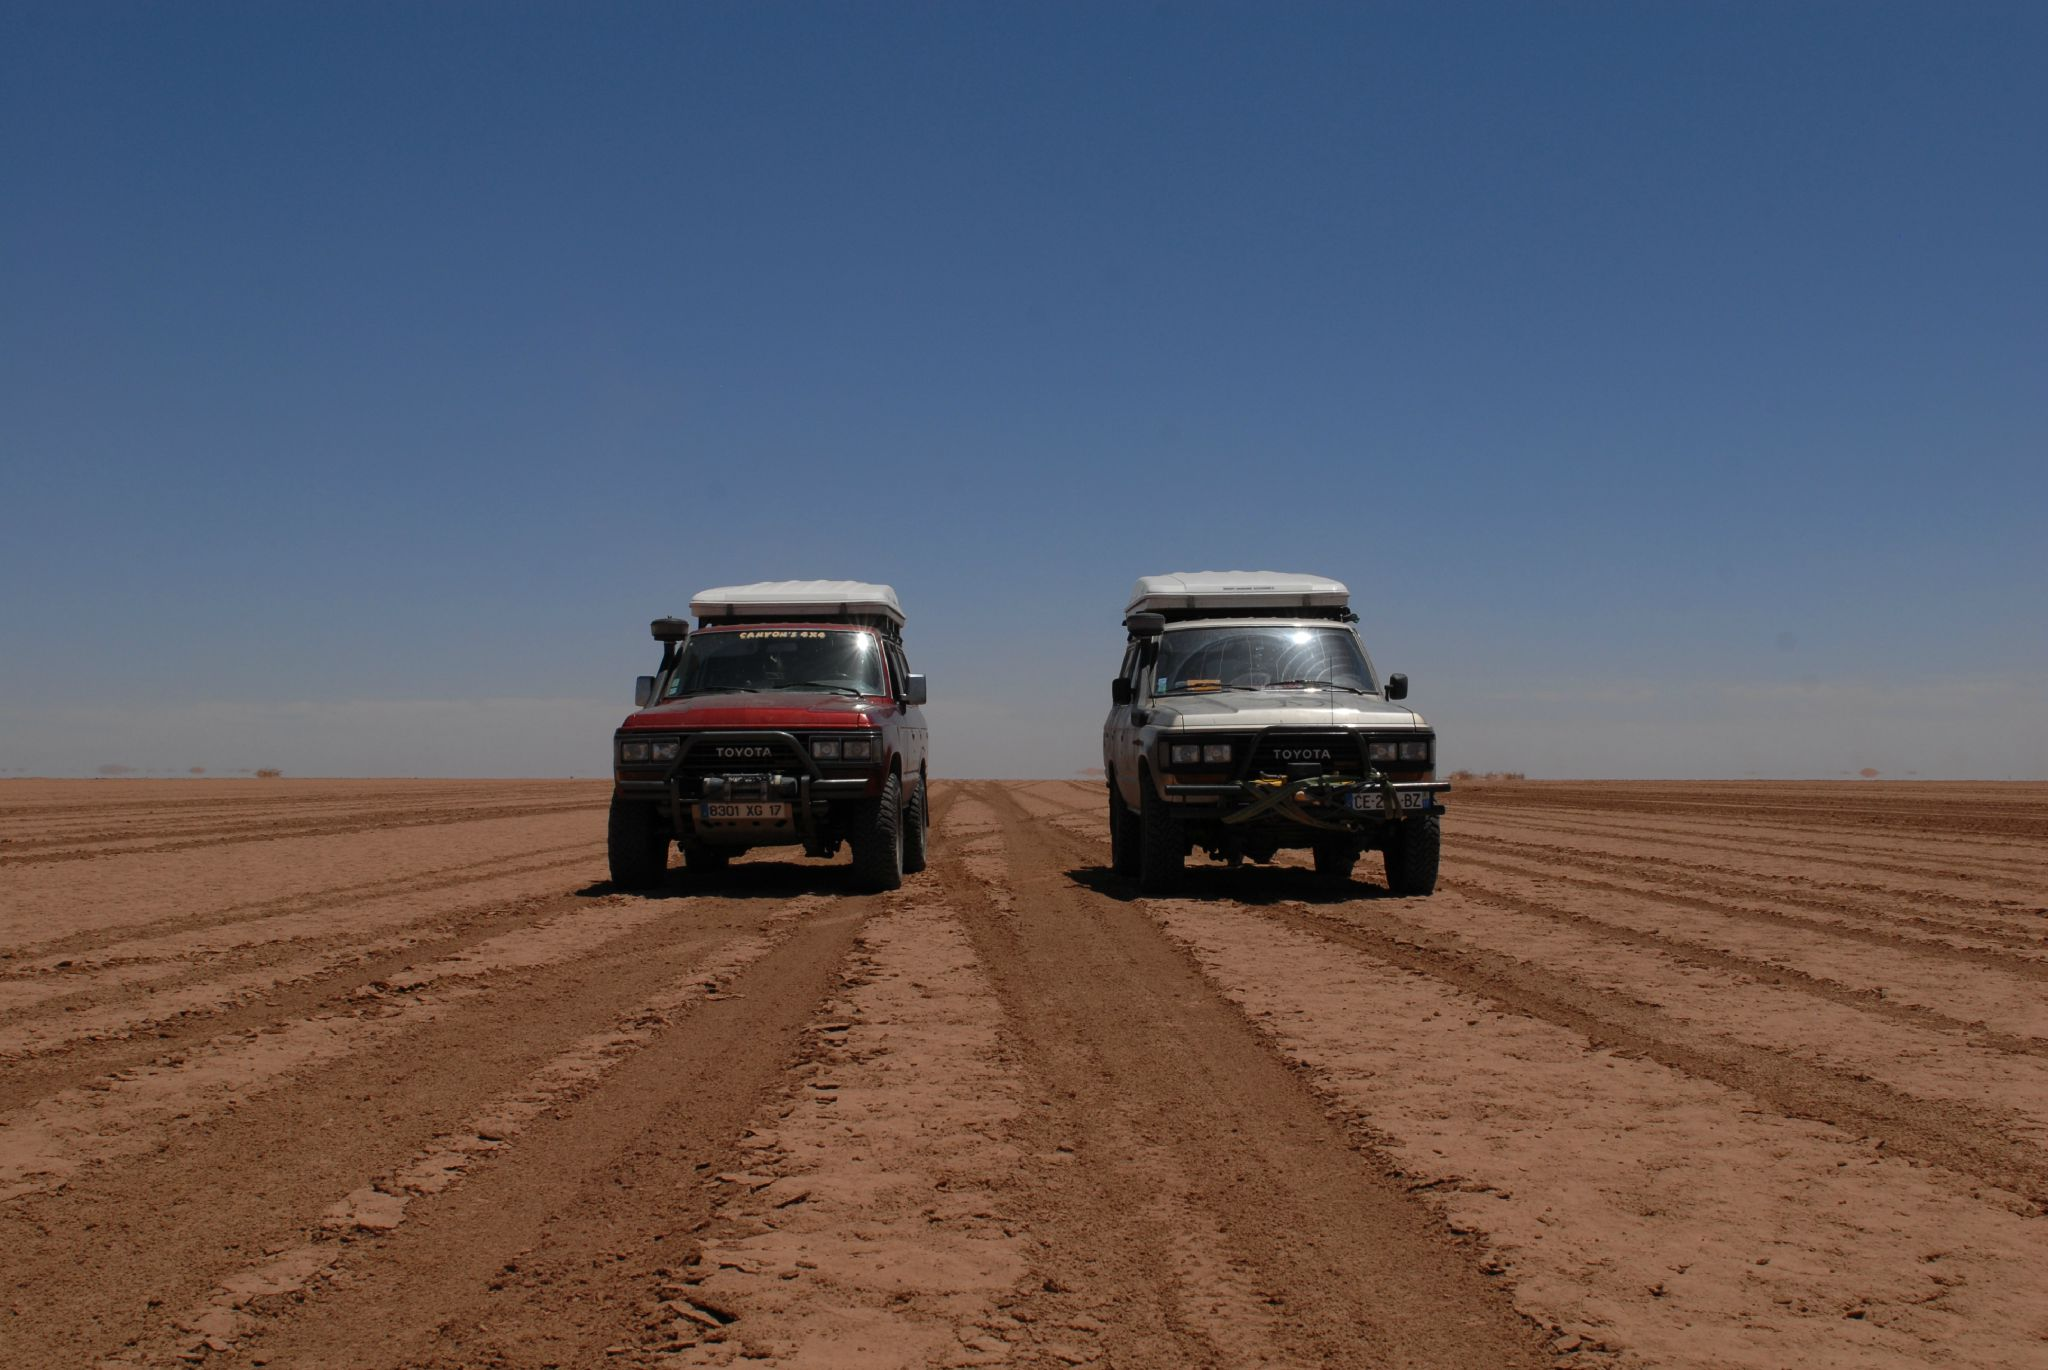 maroc2 2012 138